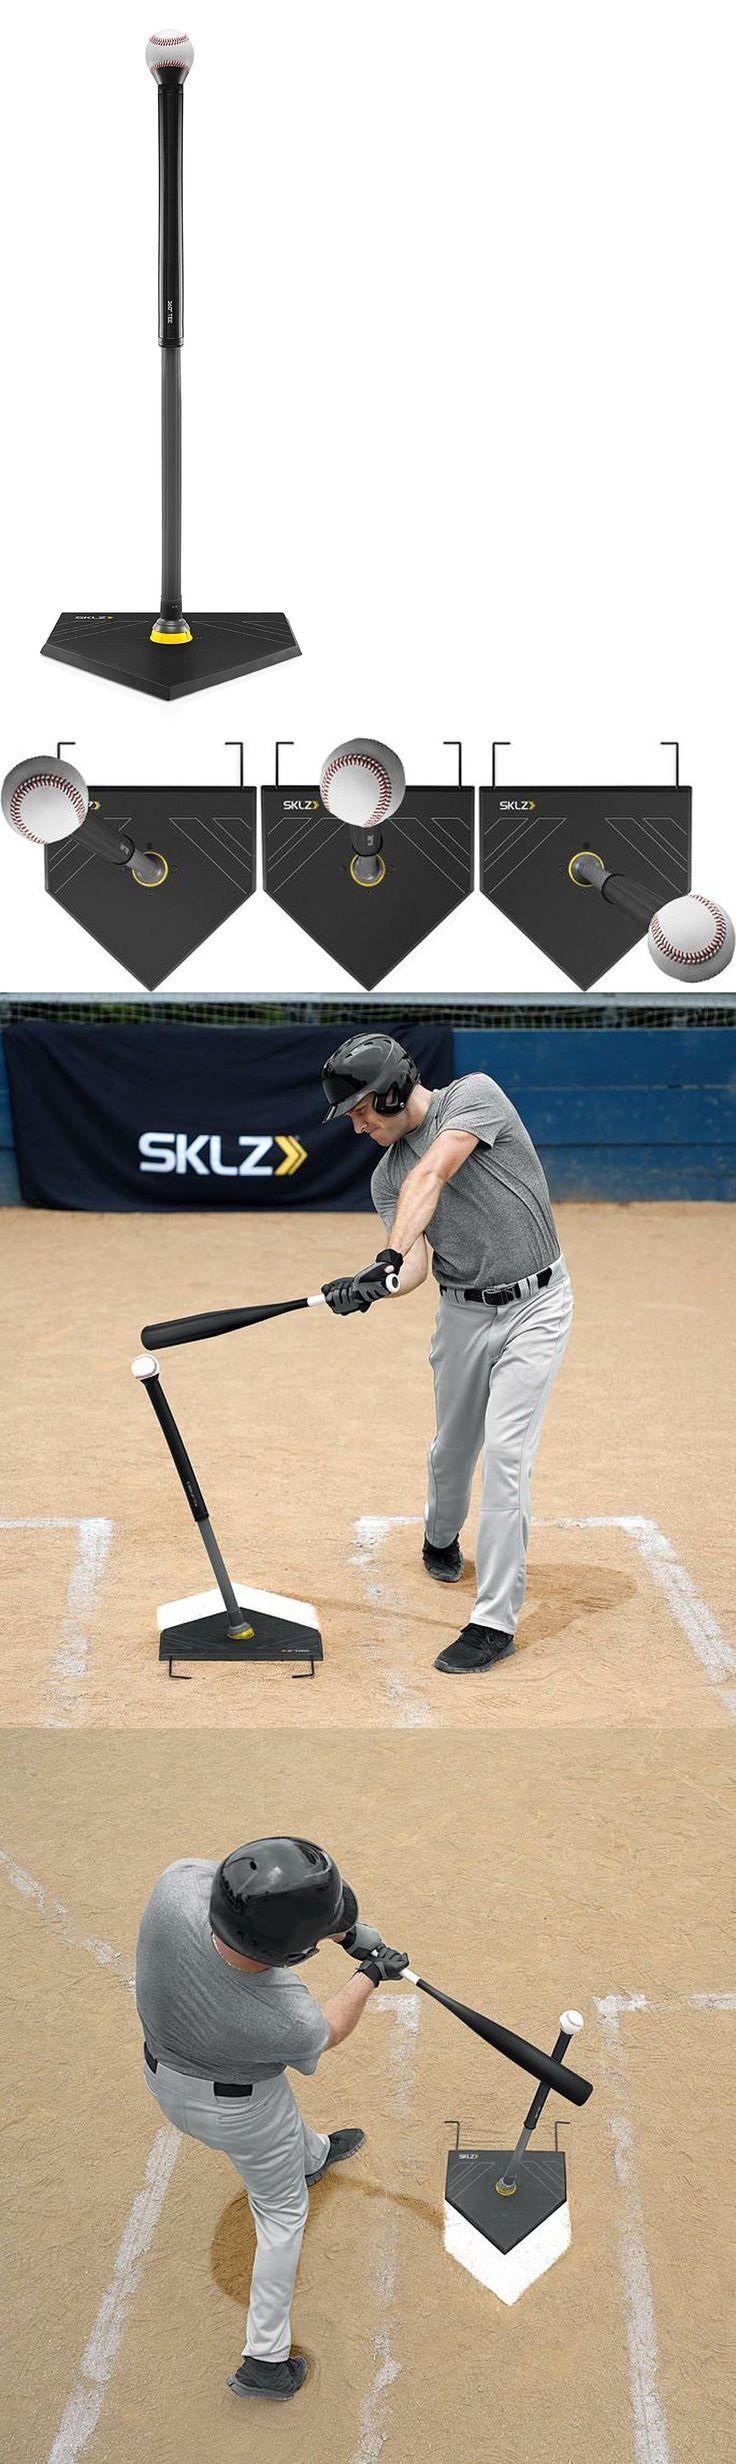 Batting Tees 108139: Batting Tee Baseball T-Ball Sklz 360 Youth Softball Adjustable Practice Hitting -> BUY IT NOW ONLY: $30.17 on eBay!